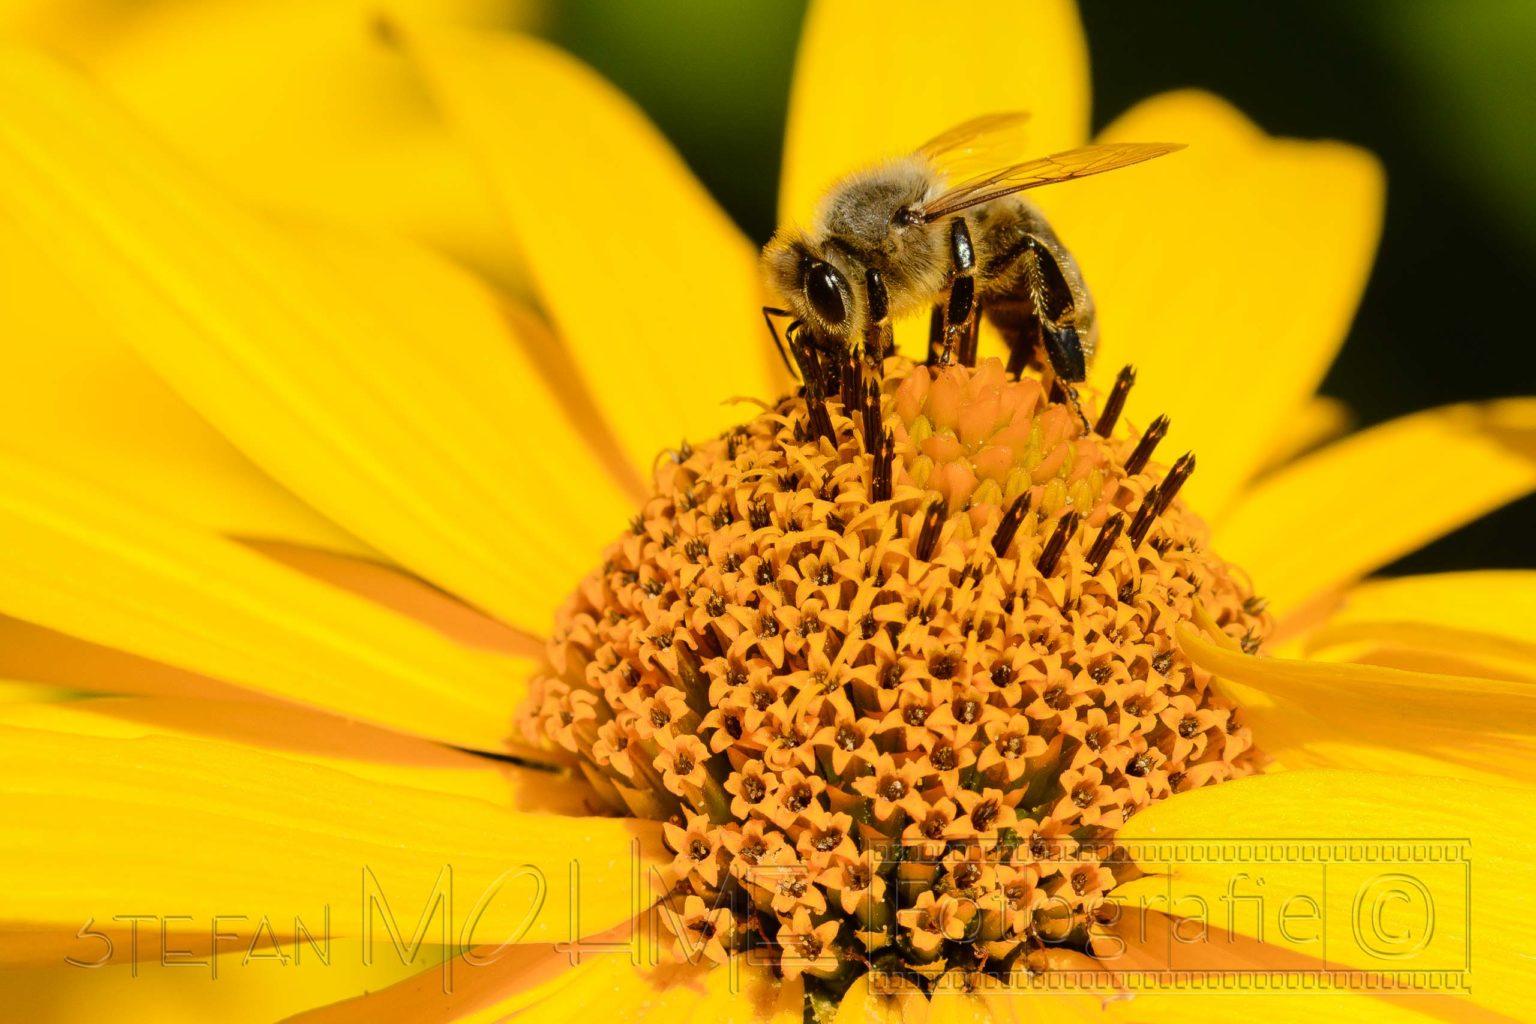 Biene,insekt,natur,makro,details,bluete,gelb